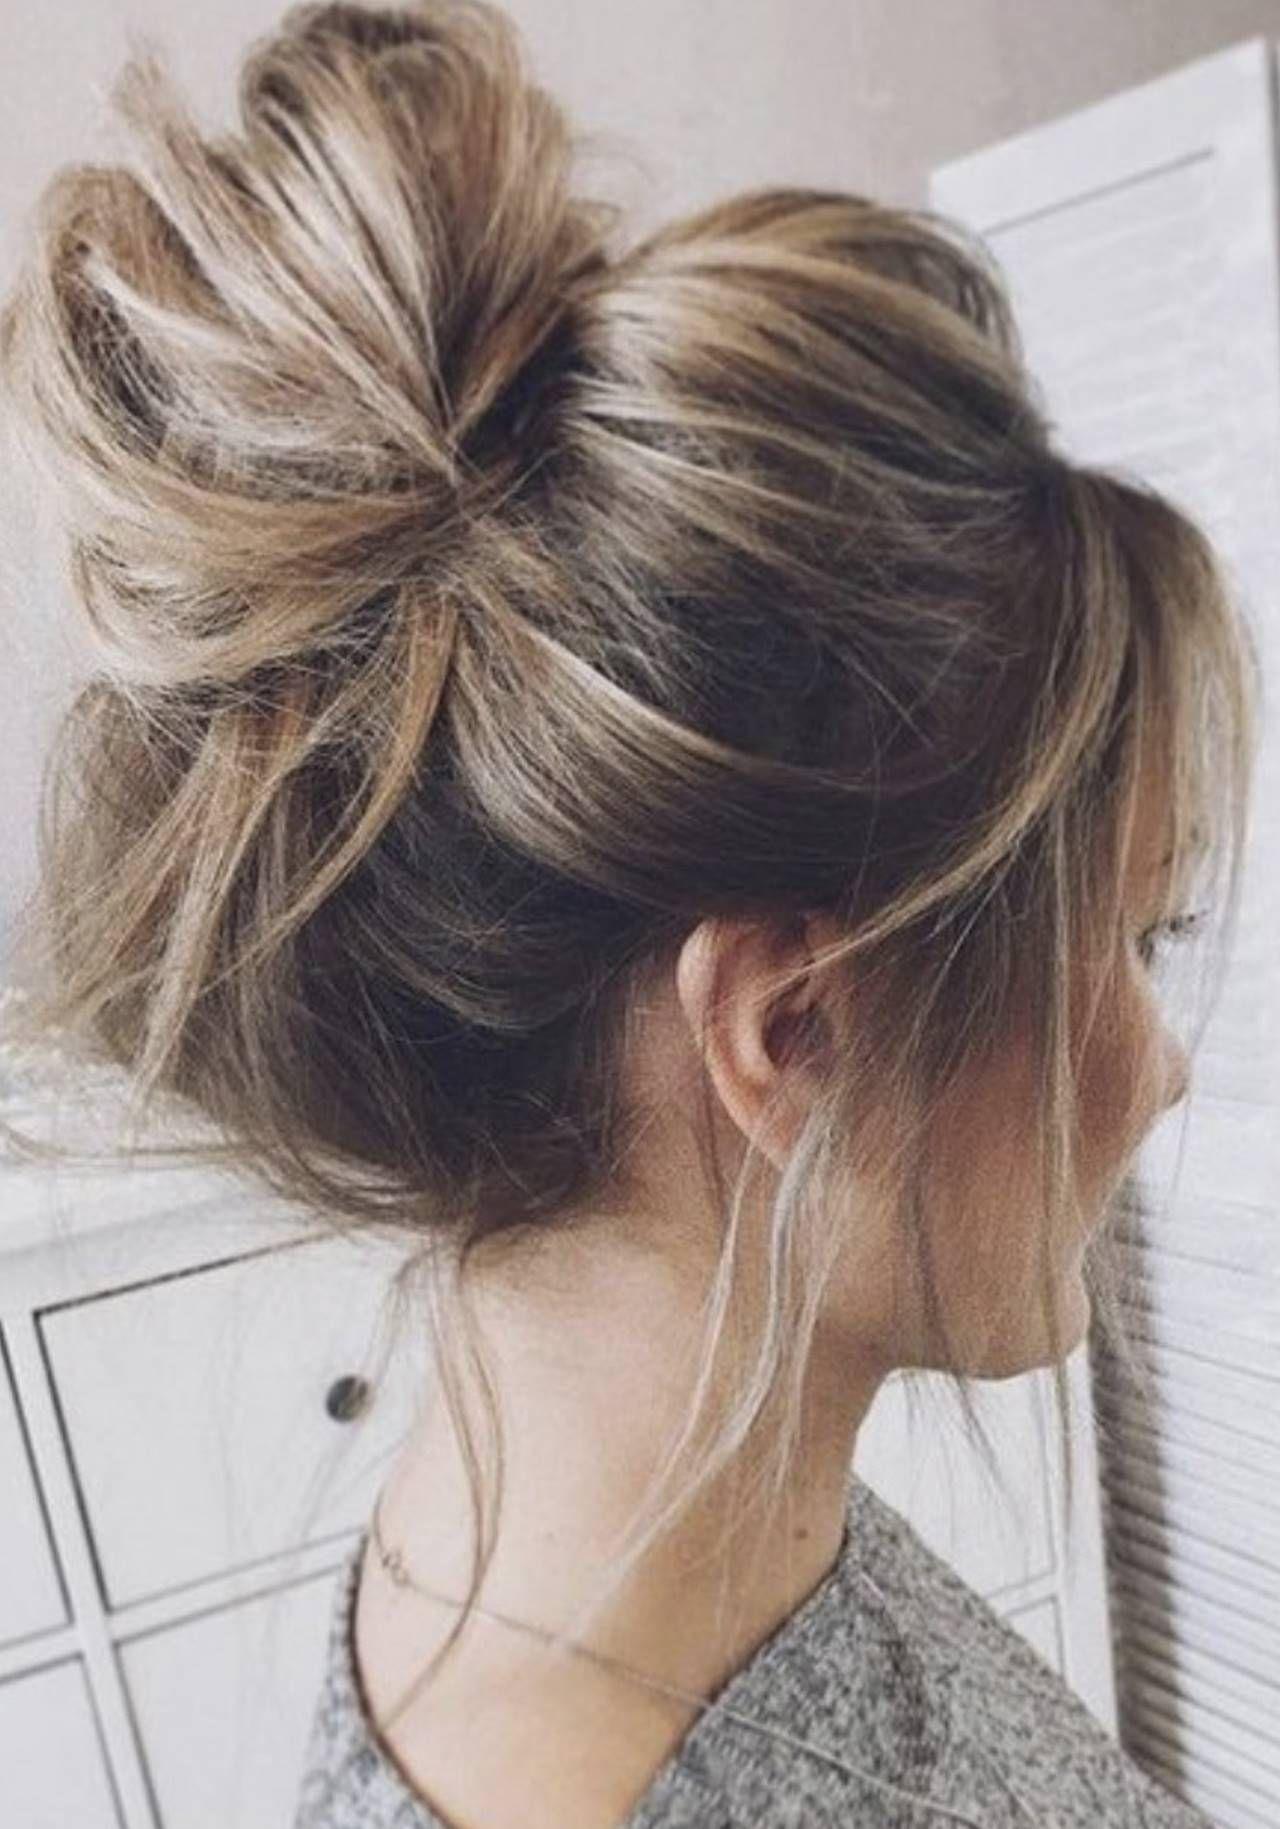 Peinados En Casa